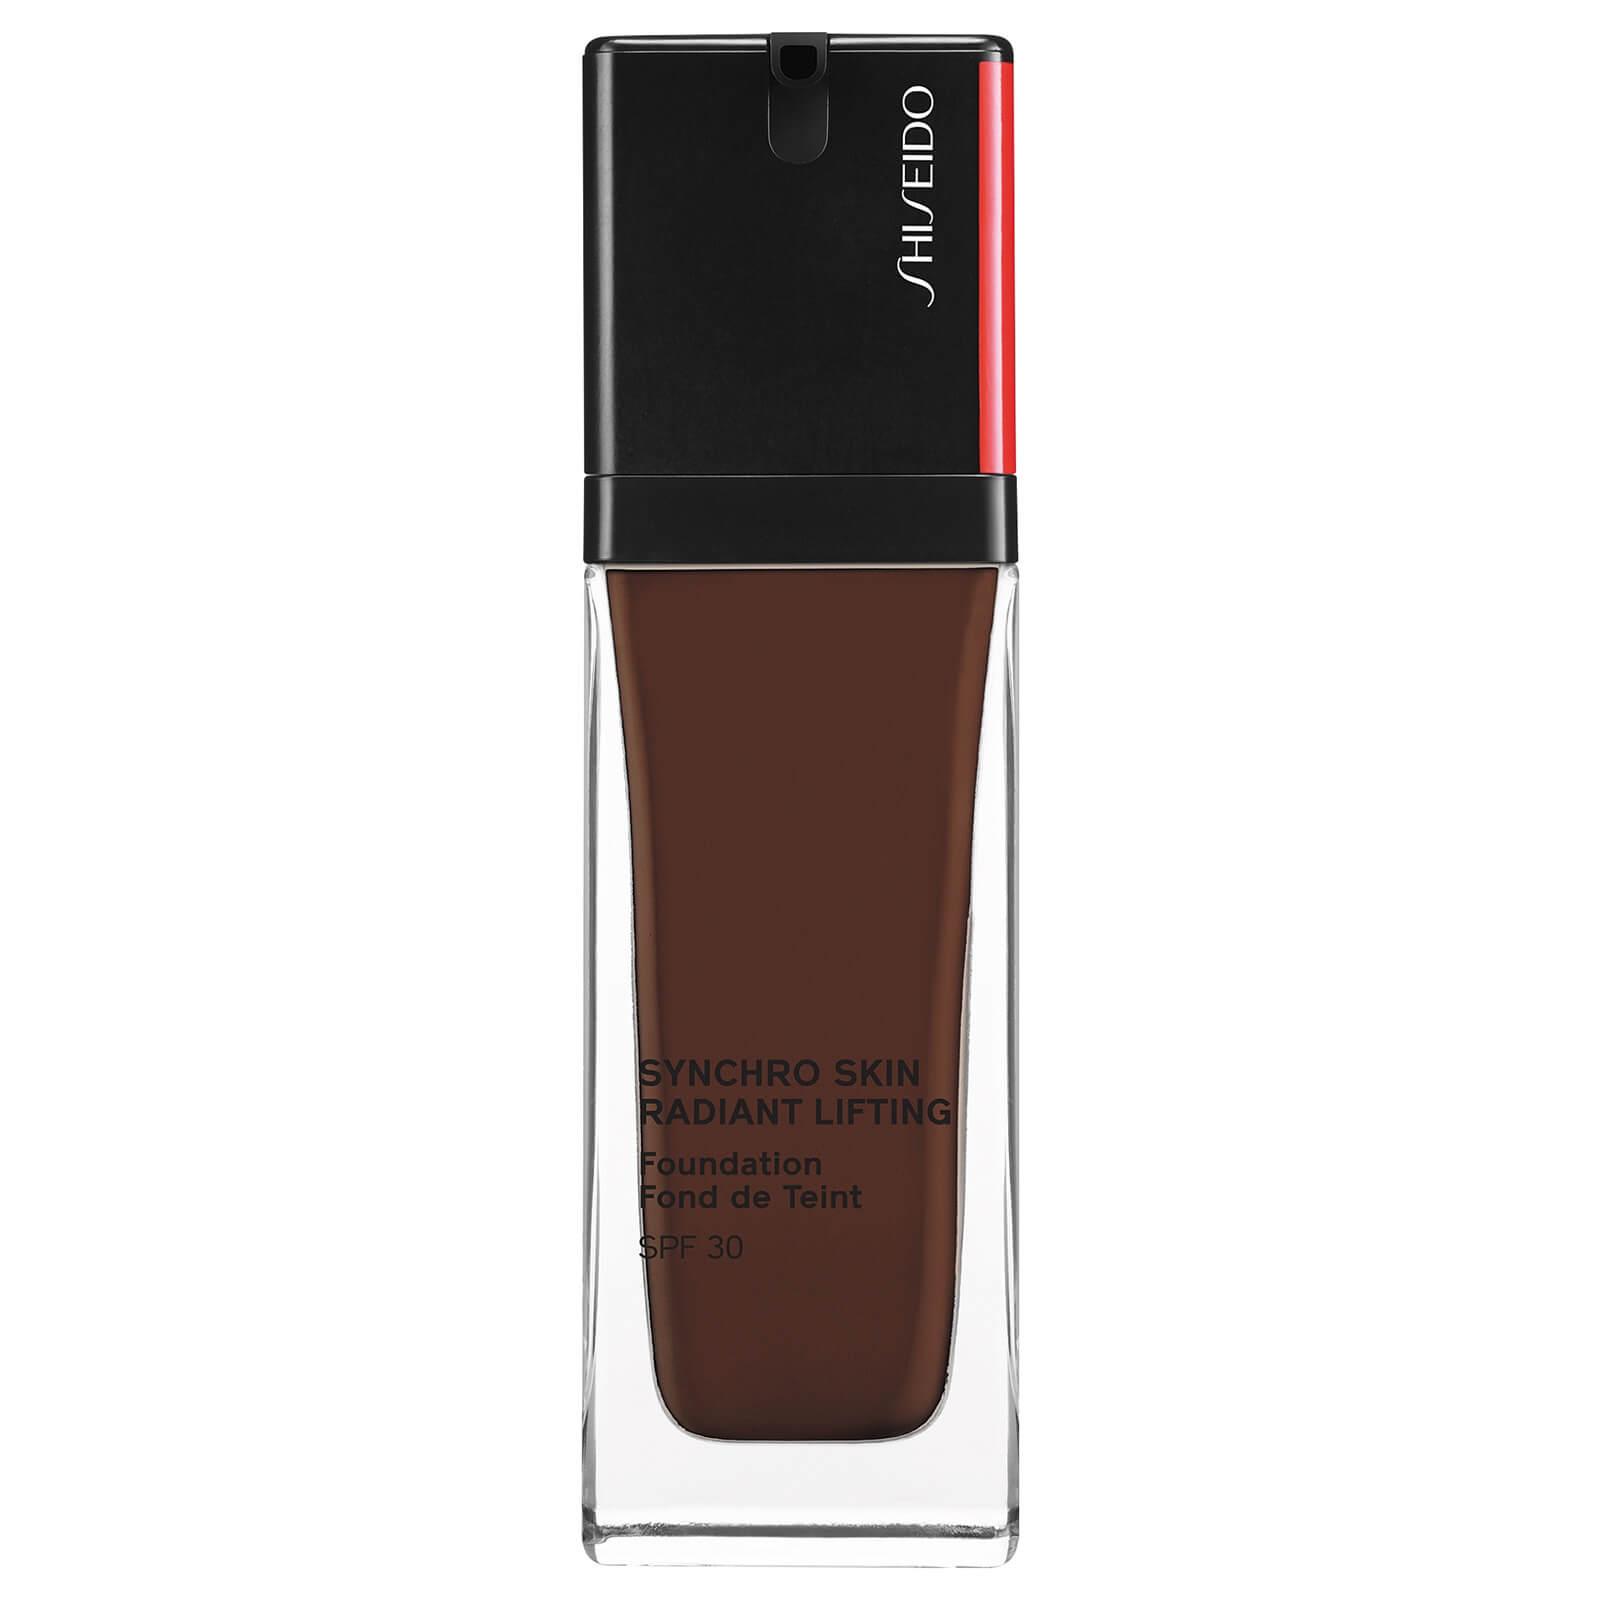 Shiseido Synchro Skin Radiant Lifting SPF30 Foundation 30ml (Various Shades) - 560 Obsidian